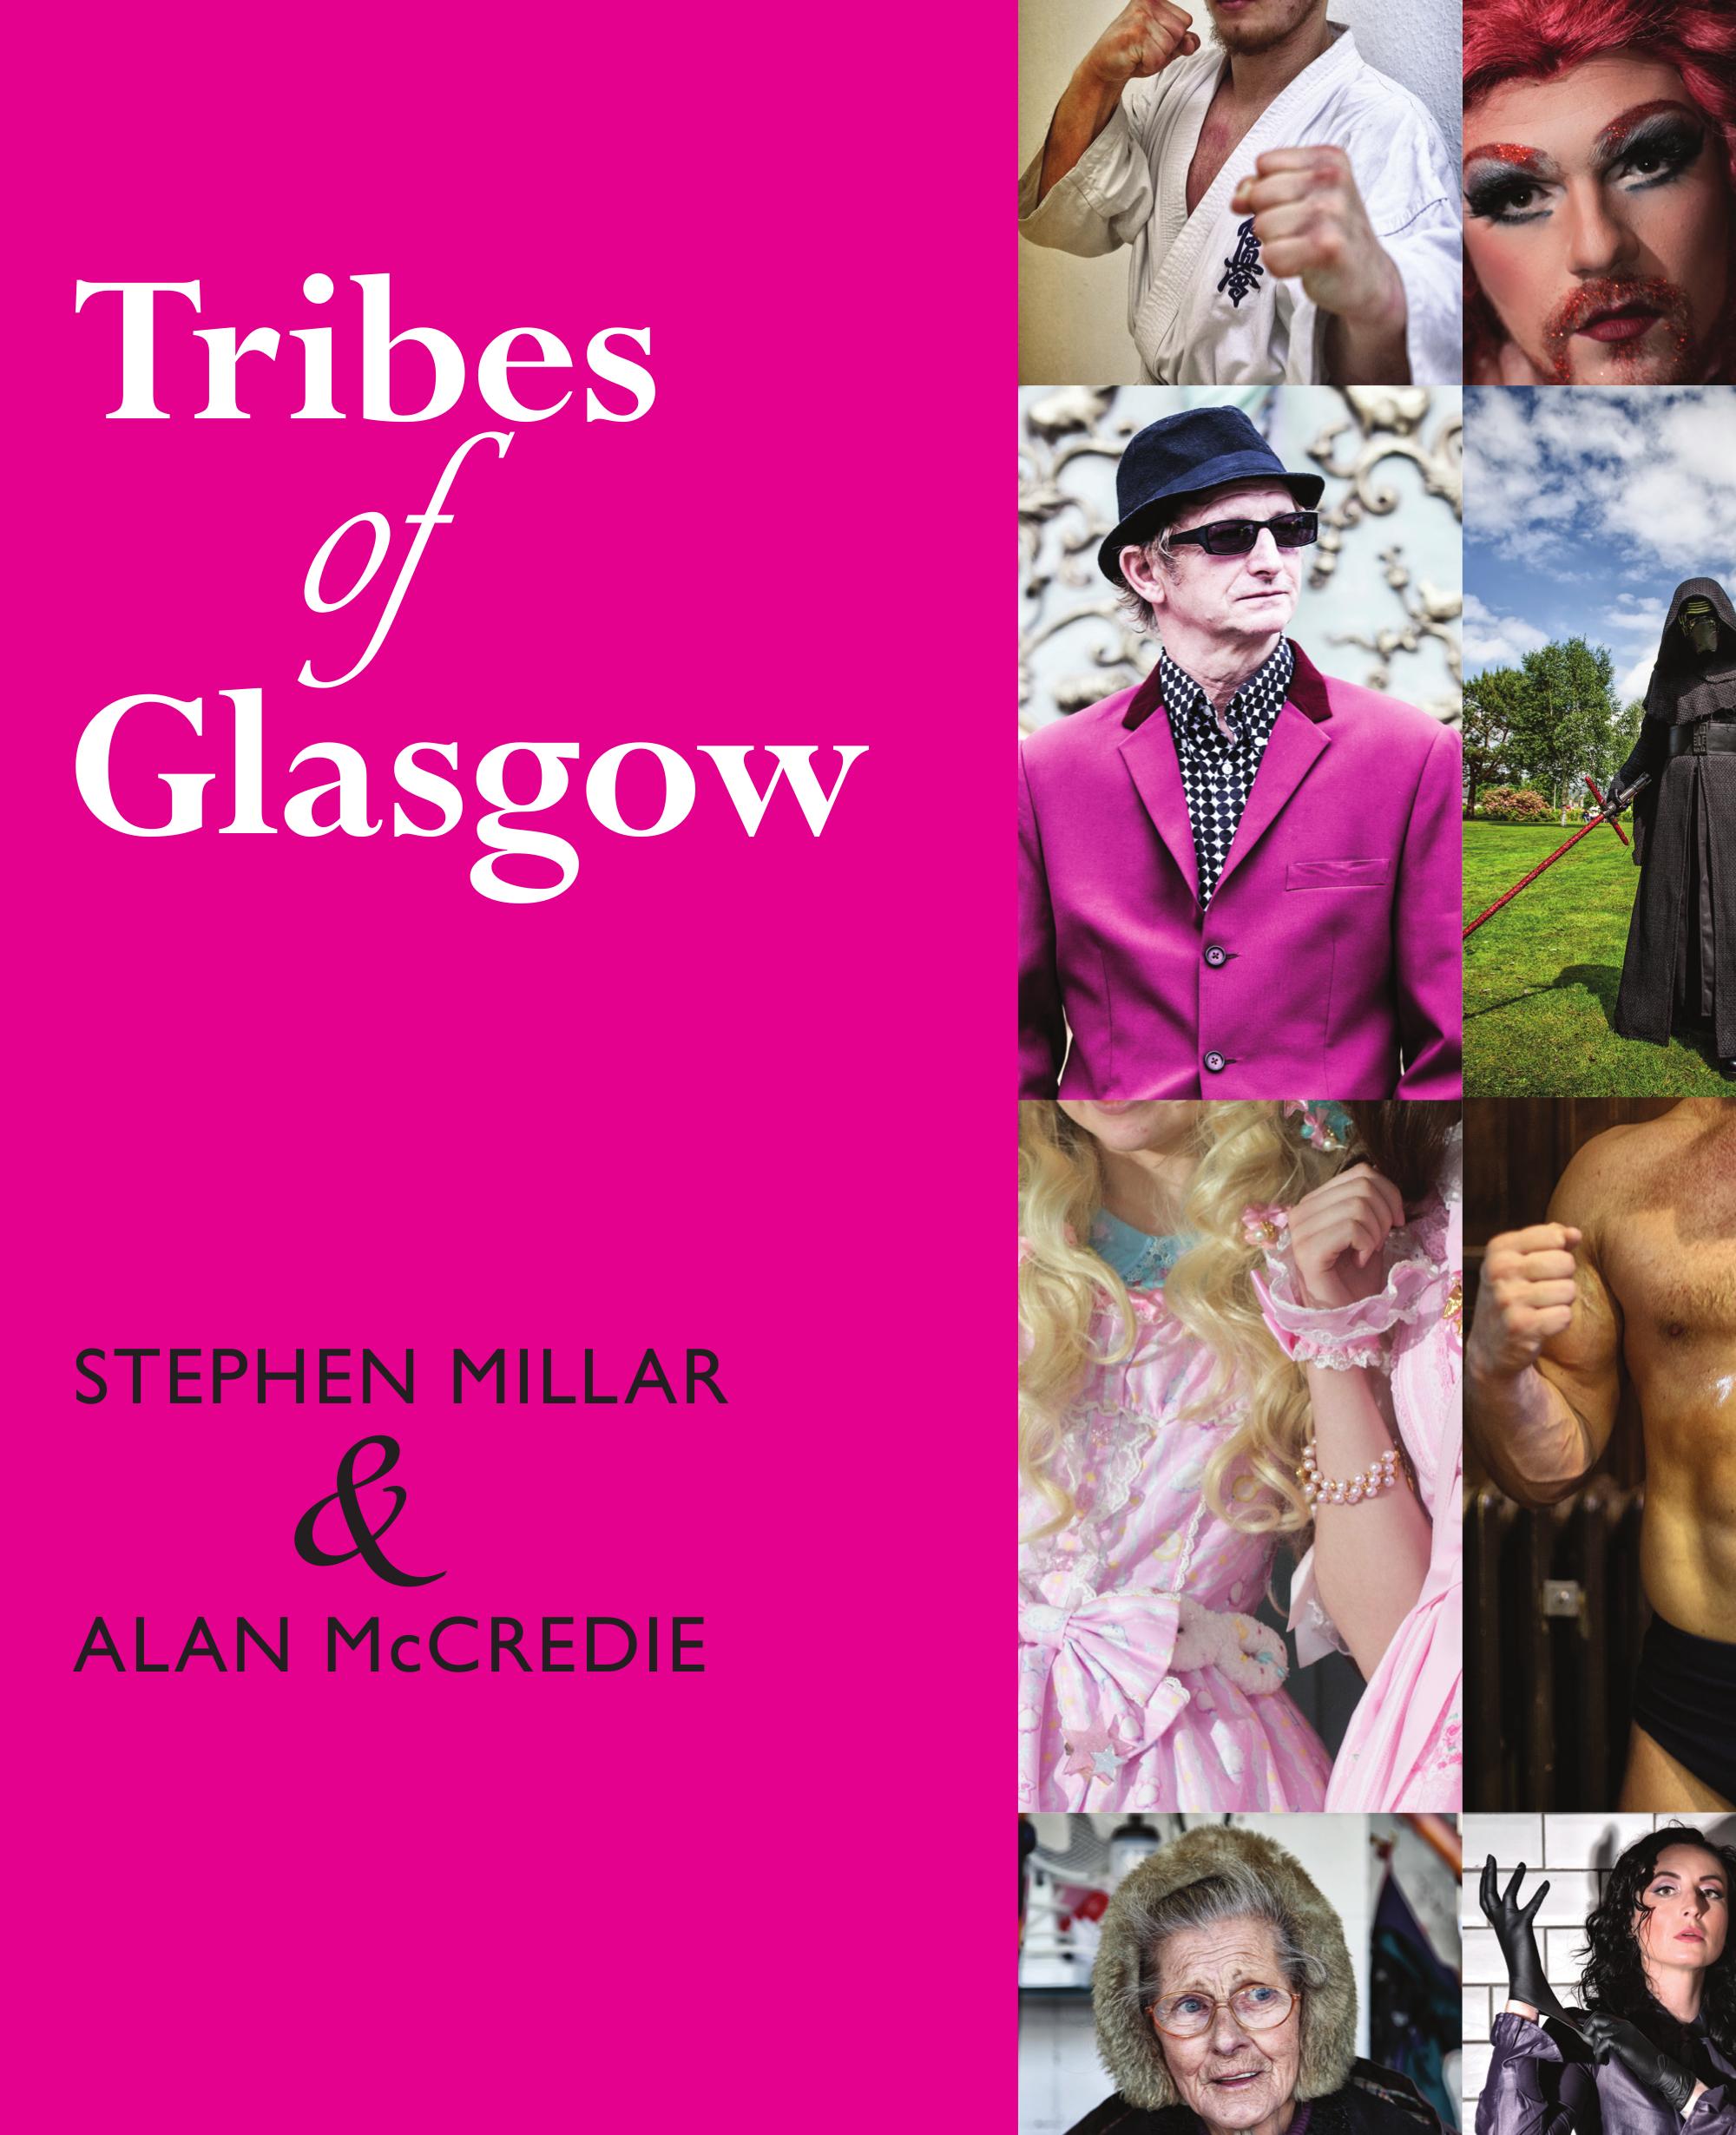 Tribes of Glasgow Stephen Millar & Alan McCredie 9781912147854 Luath Press.jpg